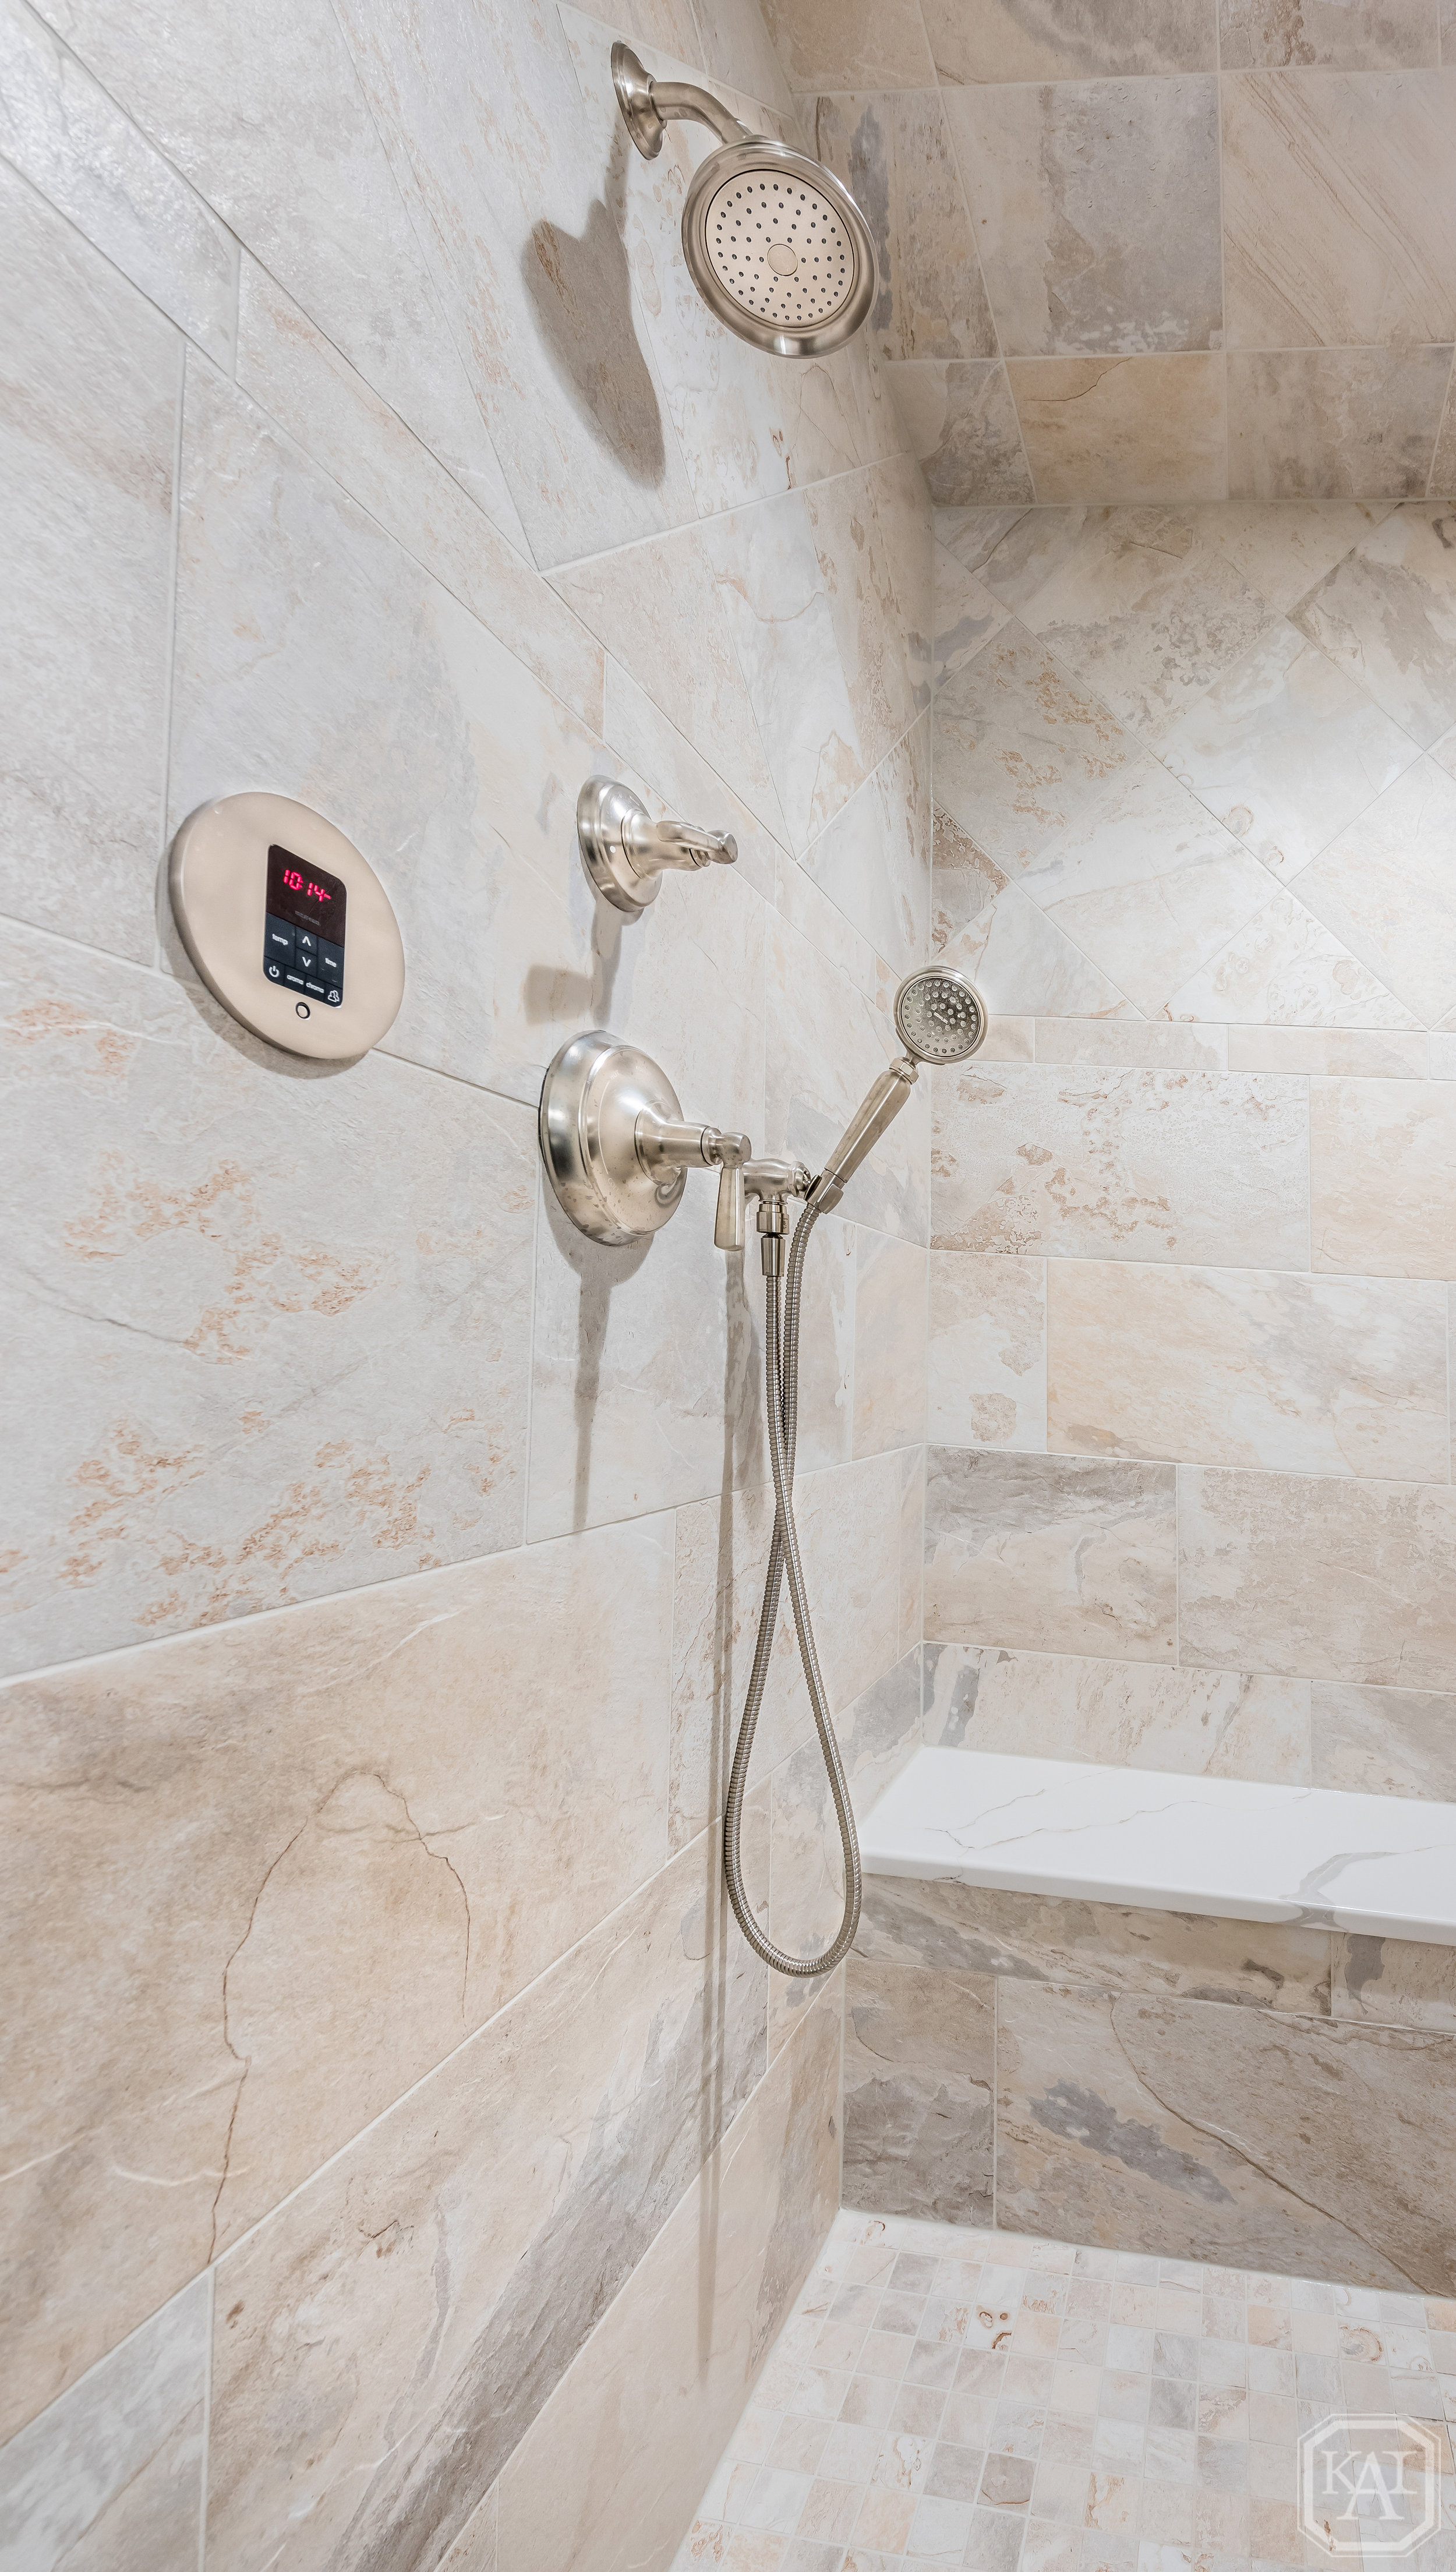 ZITELLA BASEMENT BATHROOM SHOWER_1_FINAL EDIT.jpg